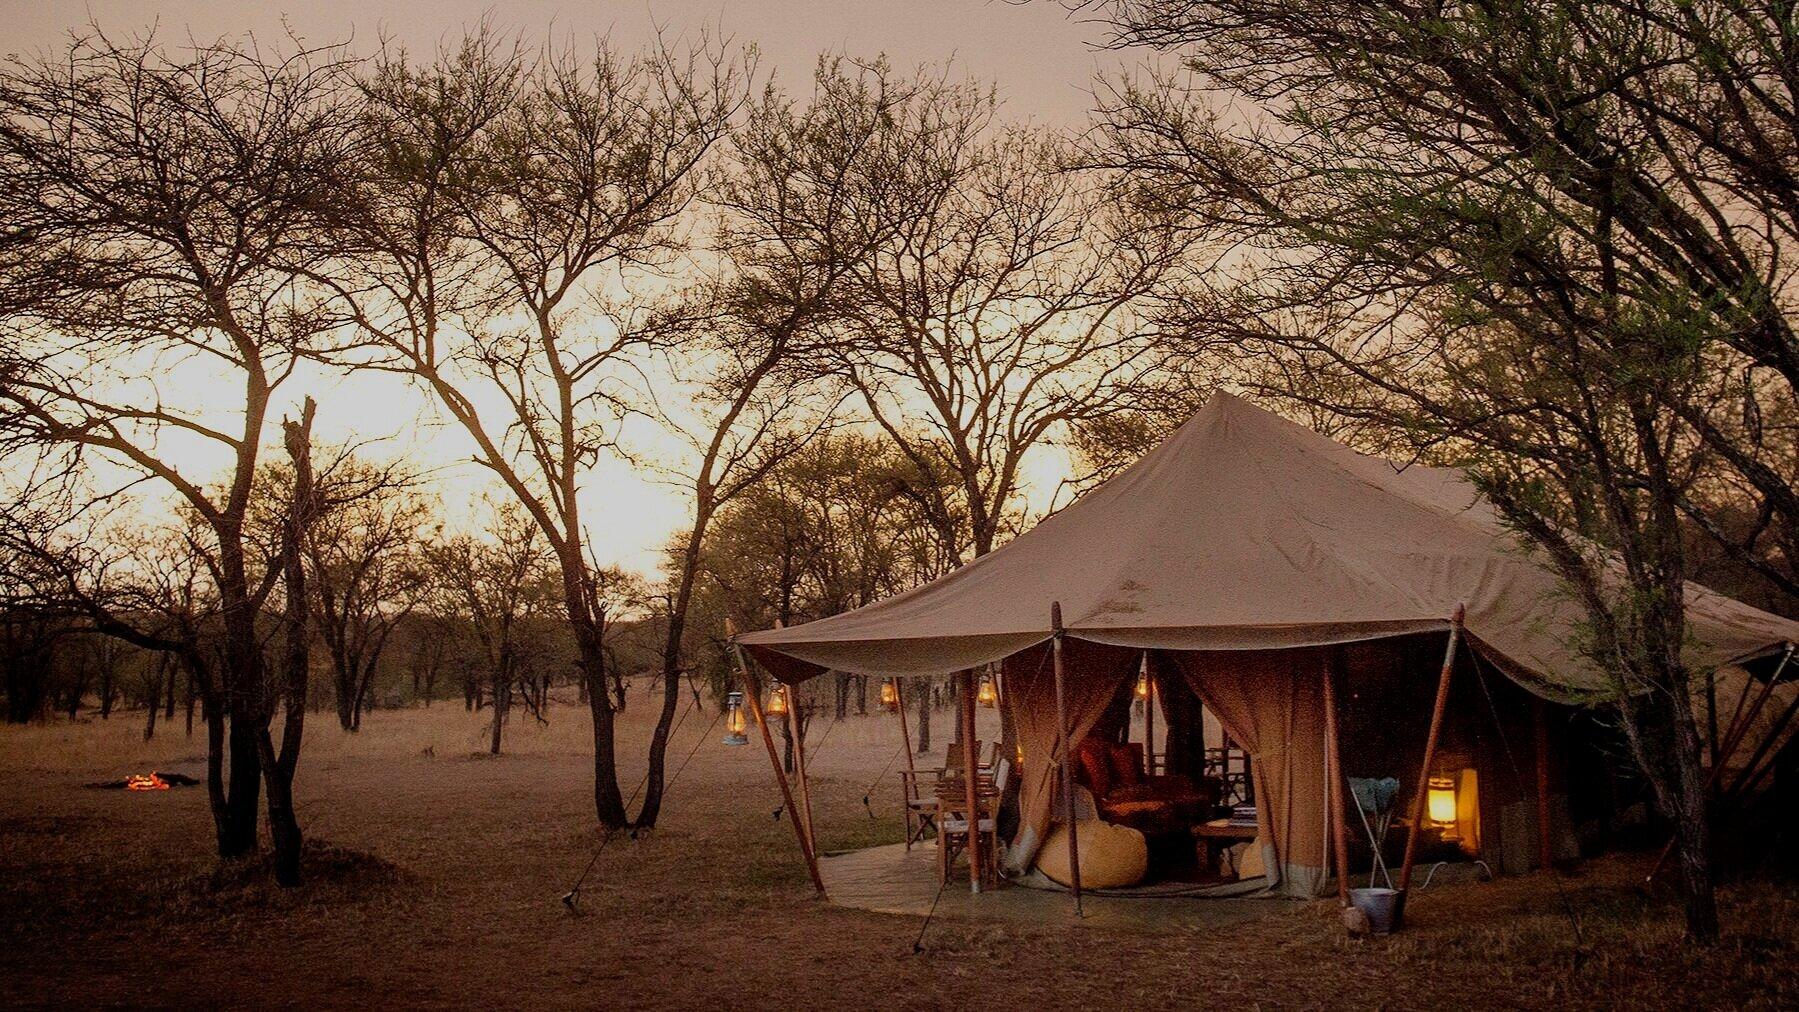 serengeti mobile camps - serian kusini mobile